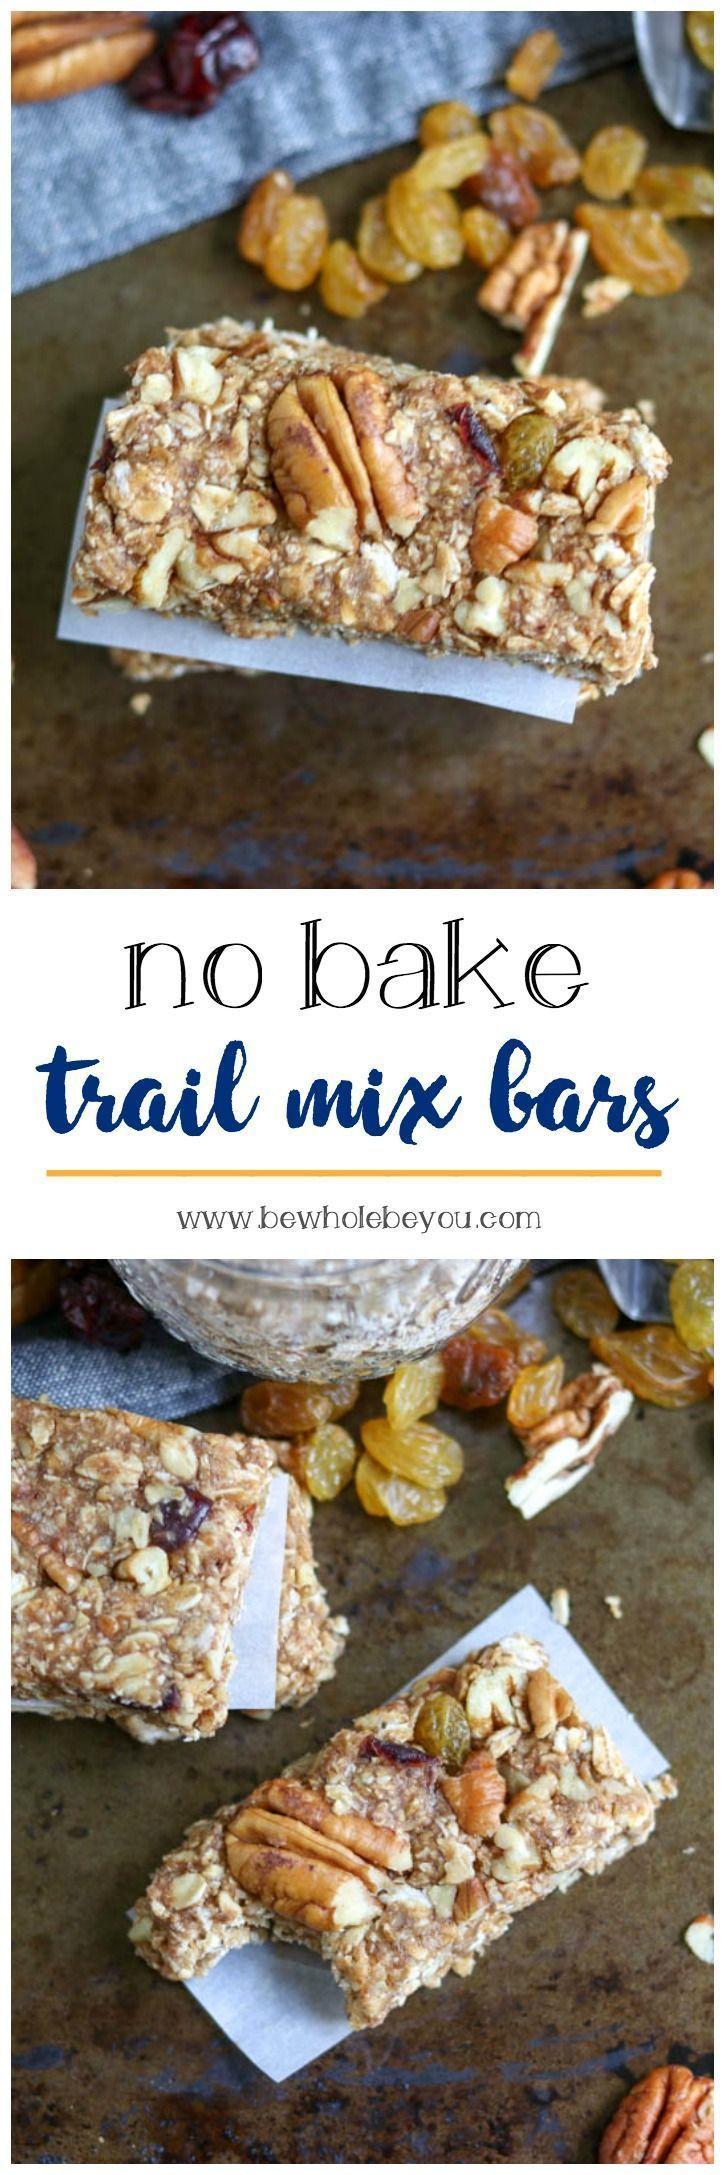 No Bake Trail Mix Bars – Abenteuer – #Abenteuer #Backen #Bars #Nein #Mix #Tr ……